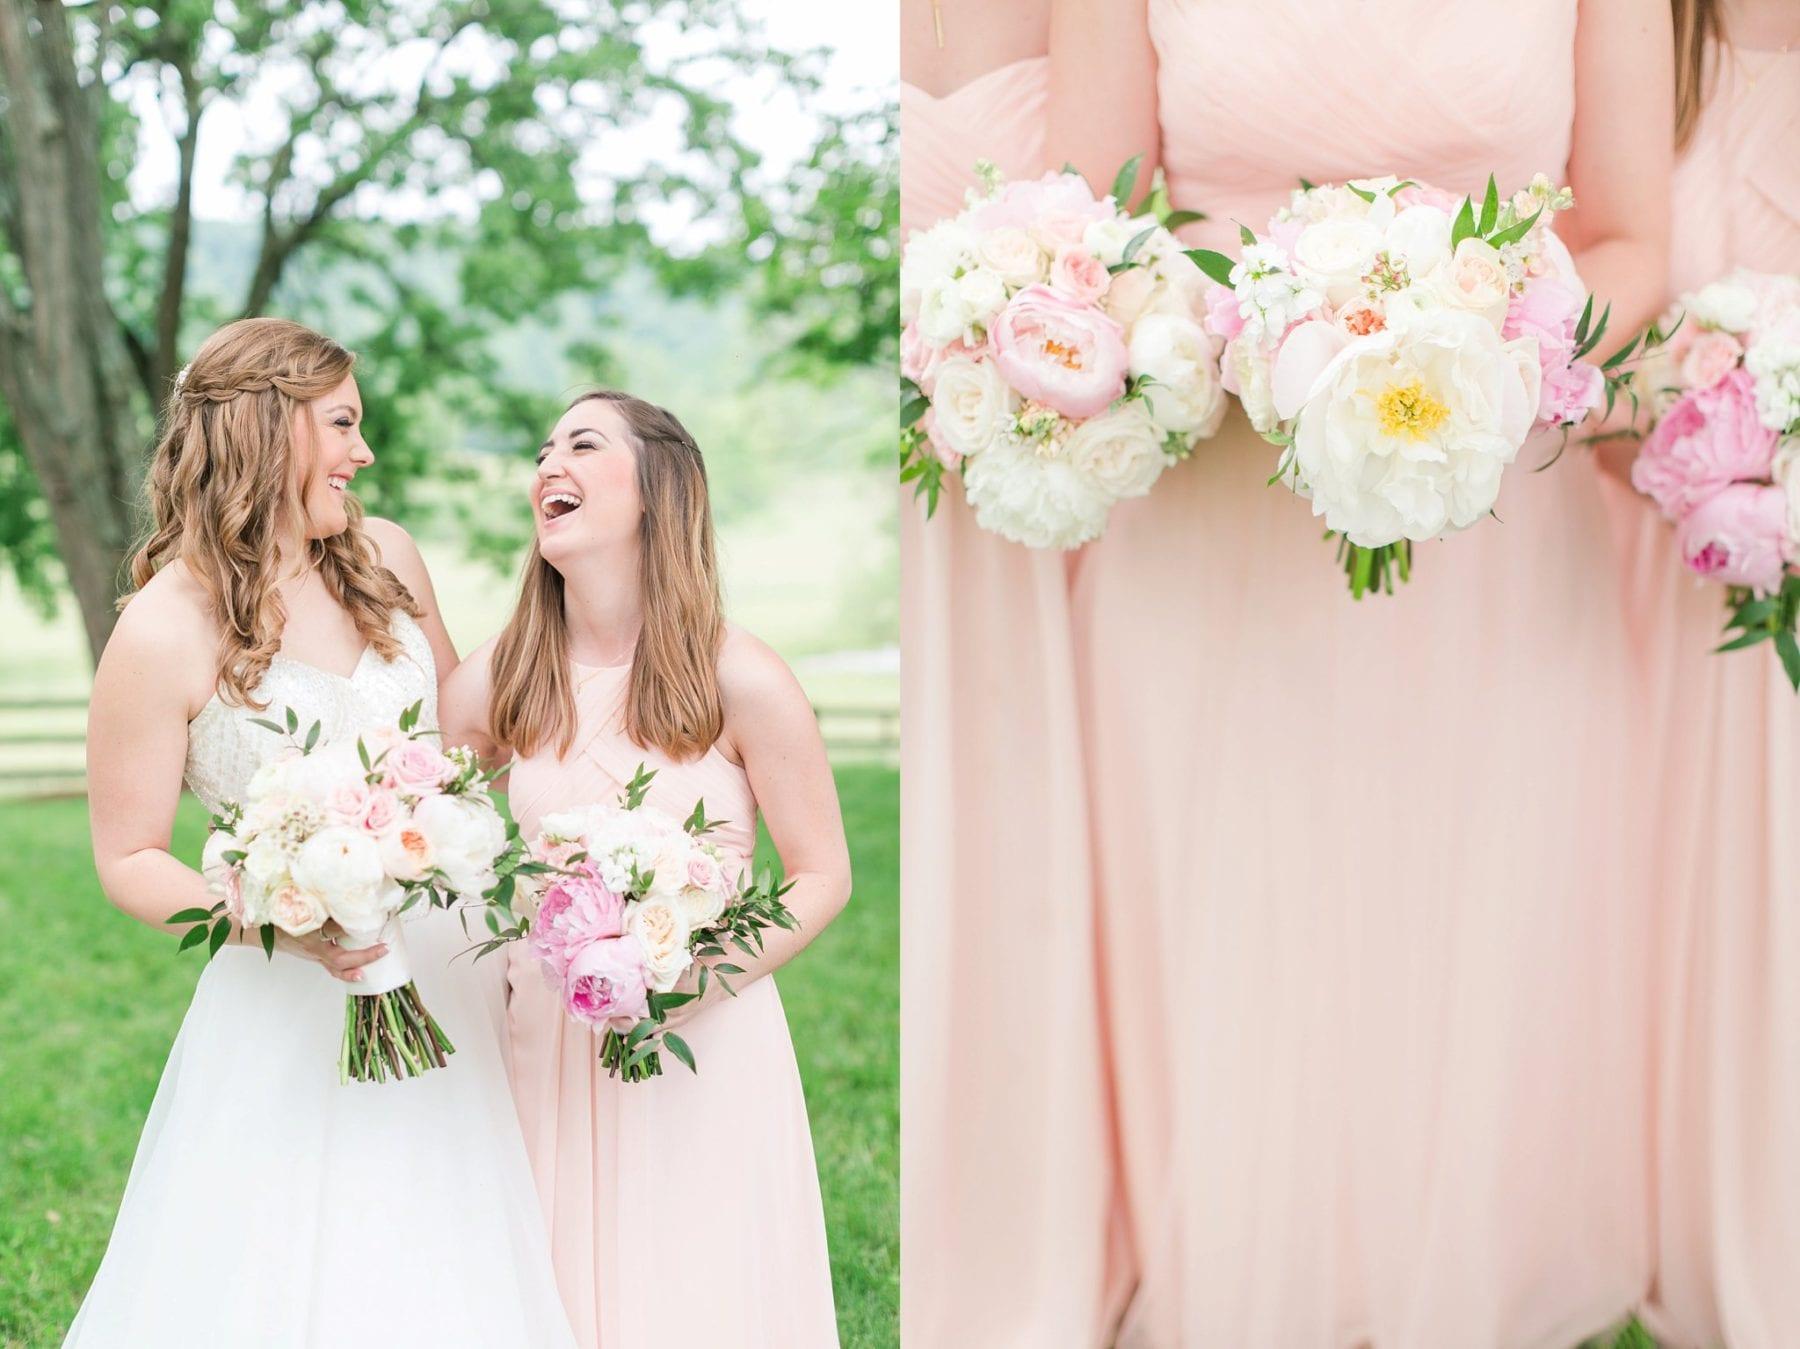 Justin & Megan Big Spring Farm Wedding Photos-158.jpg